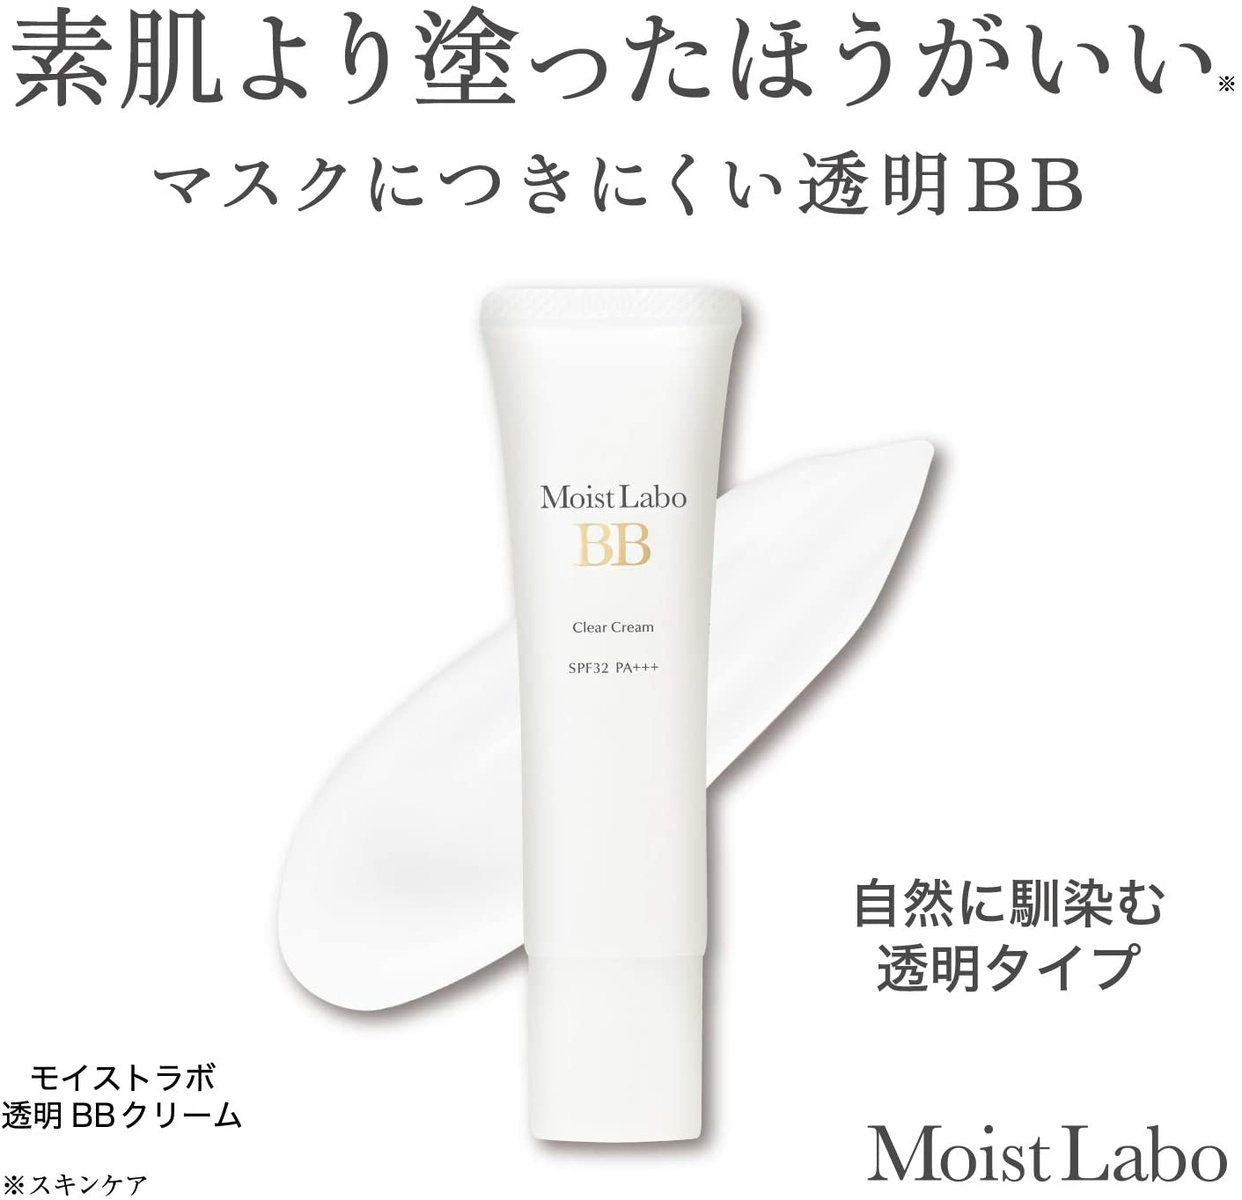 Moist Labo(モイストラボ)透明BBクリーム